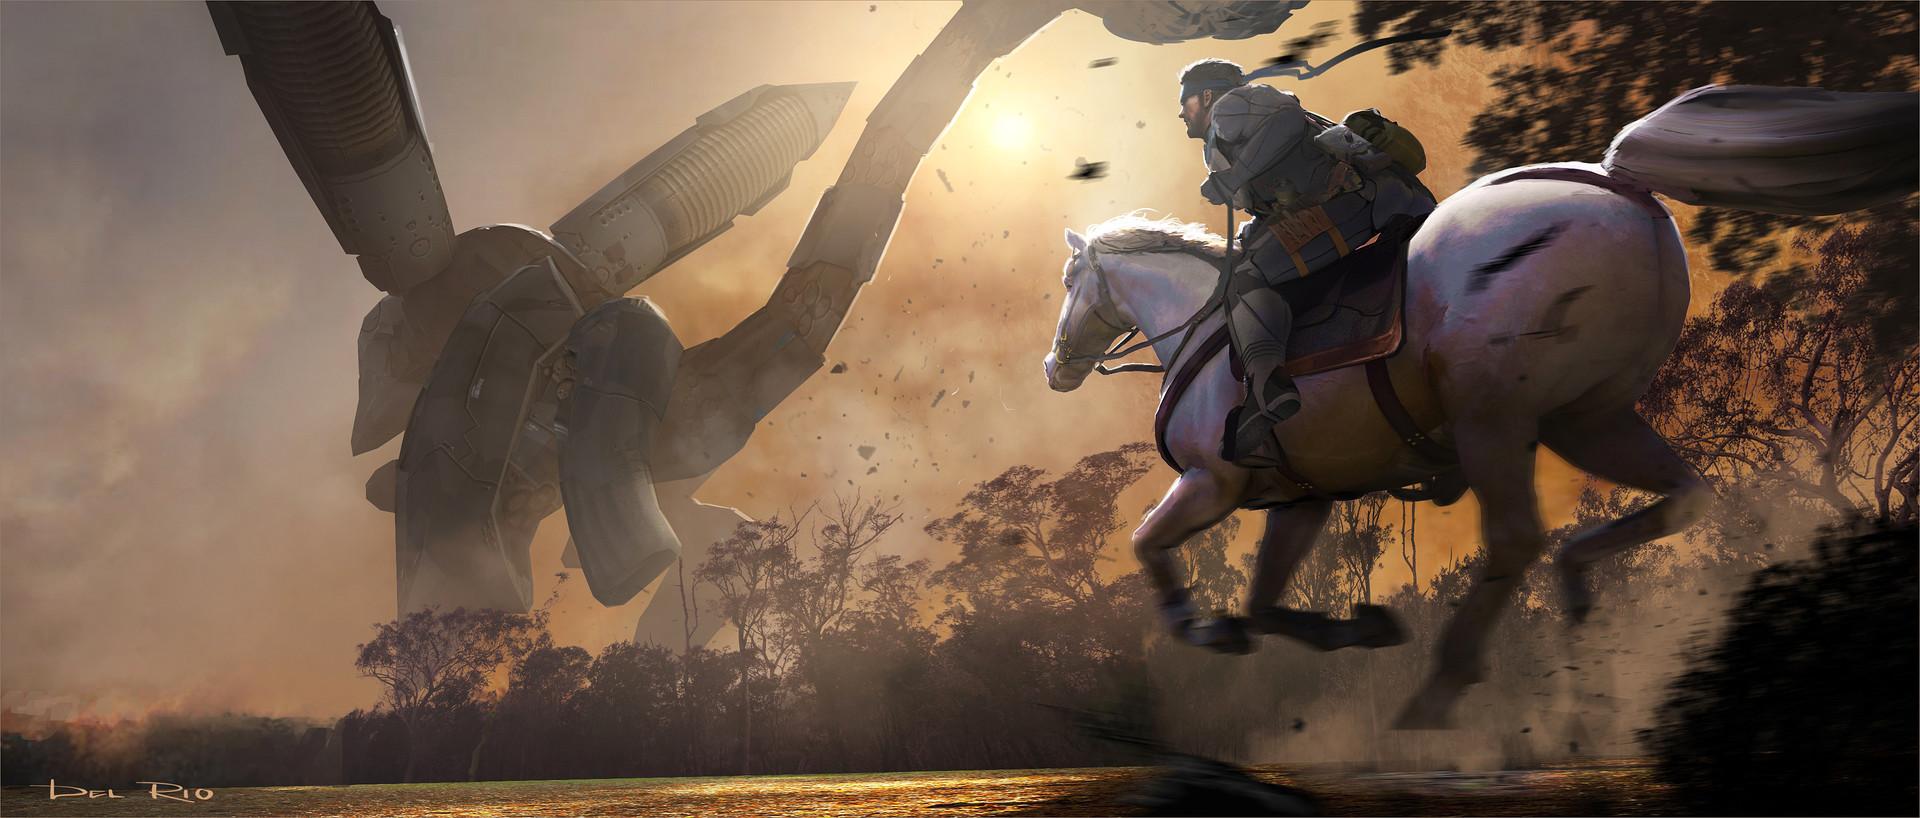 Eddie del rio snake on a horse